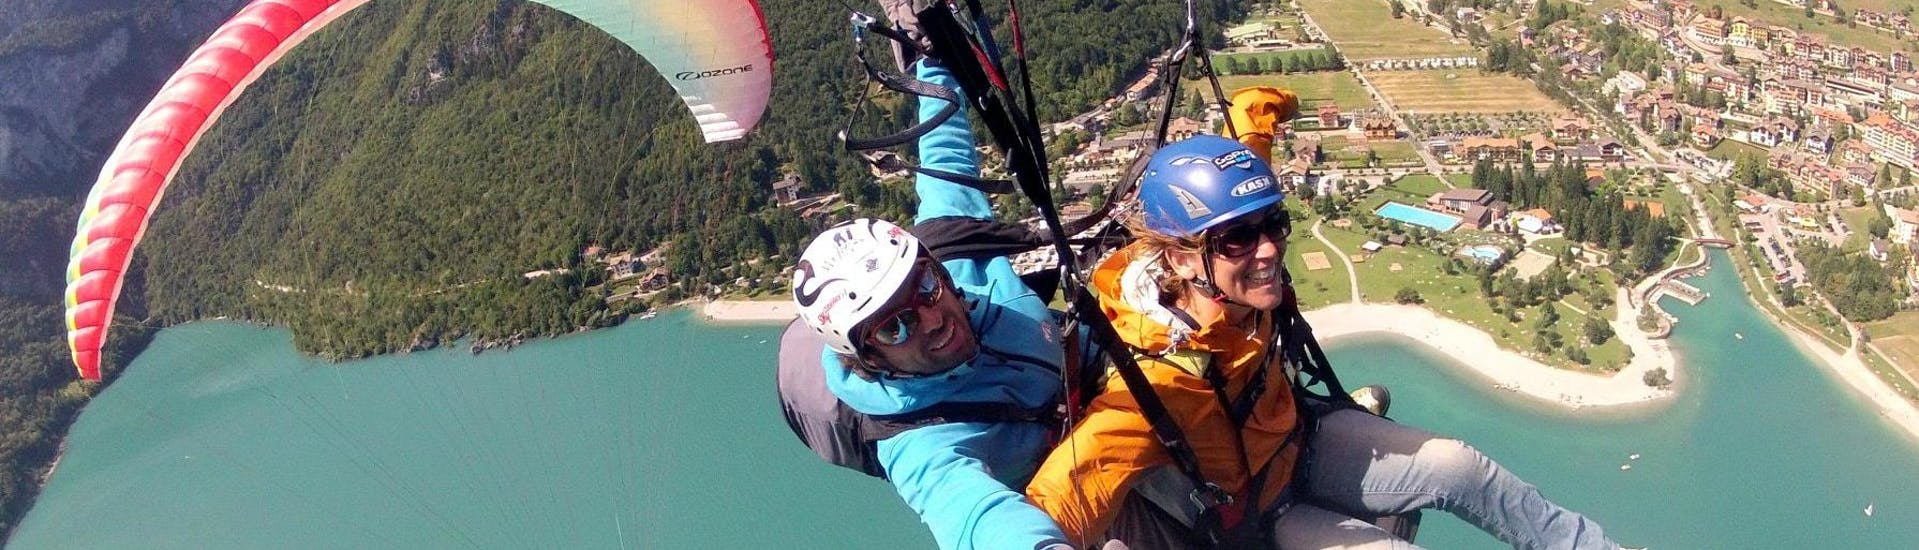 acrobatic-tandem-paragliding-in-molveno-ifly-tandem-hero